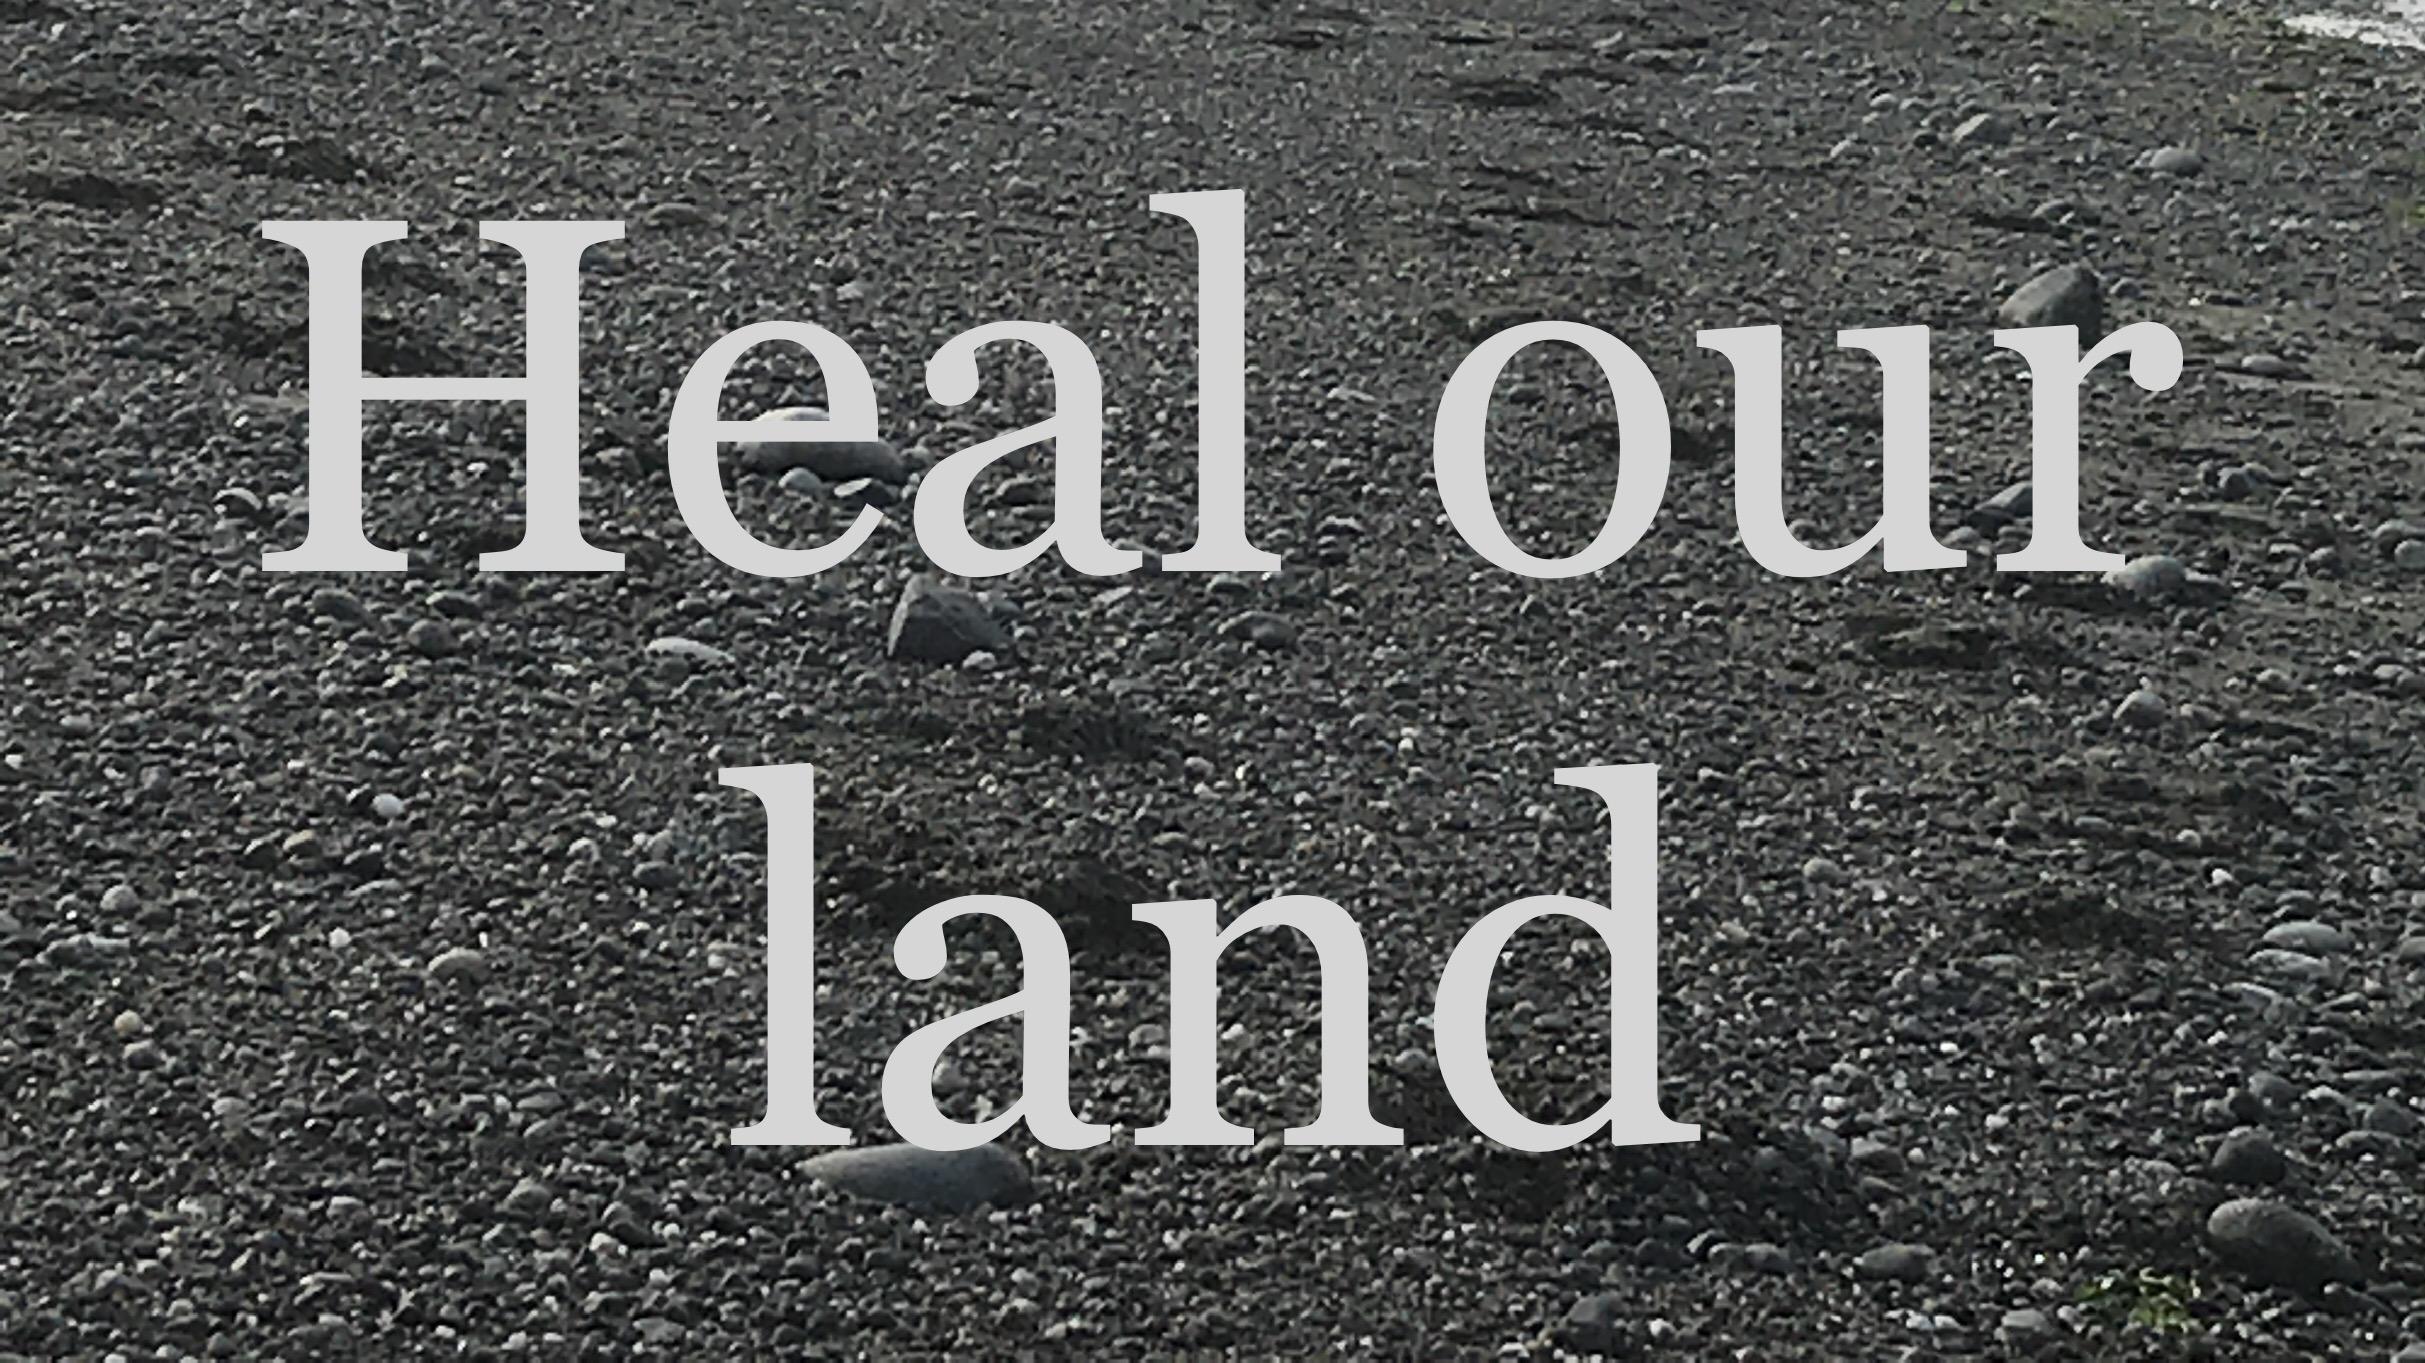 HealourLand